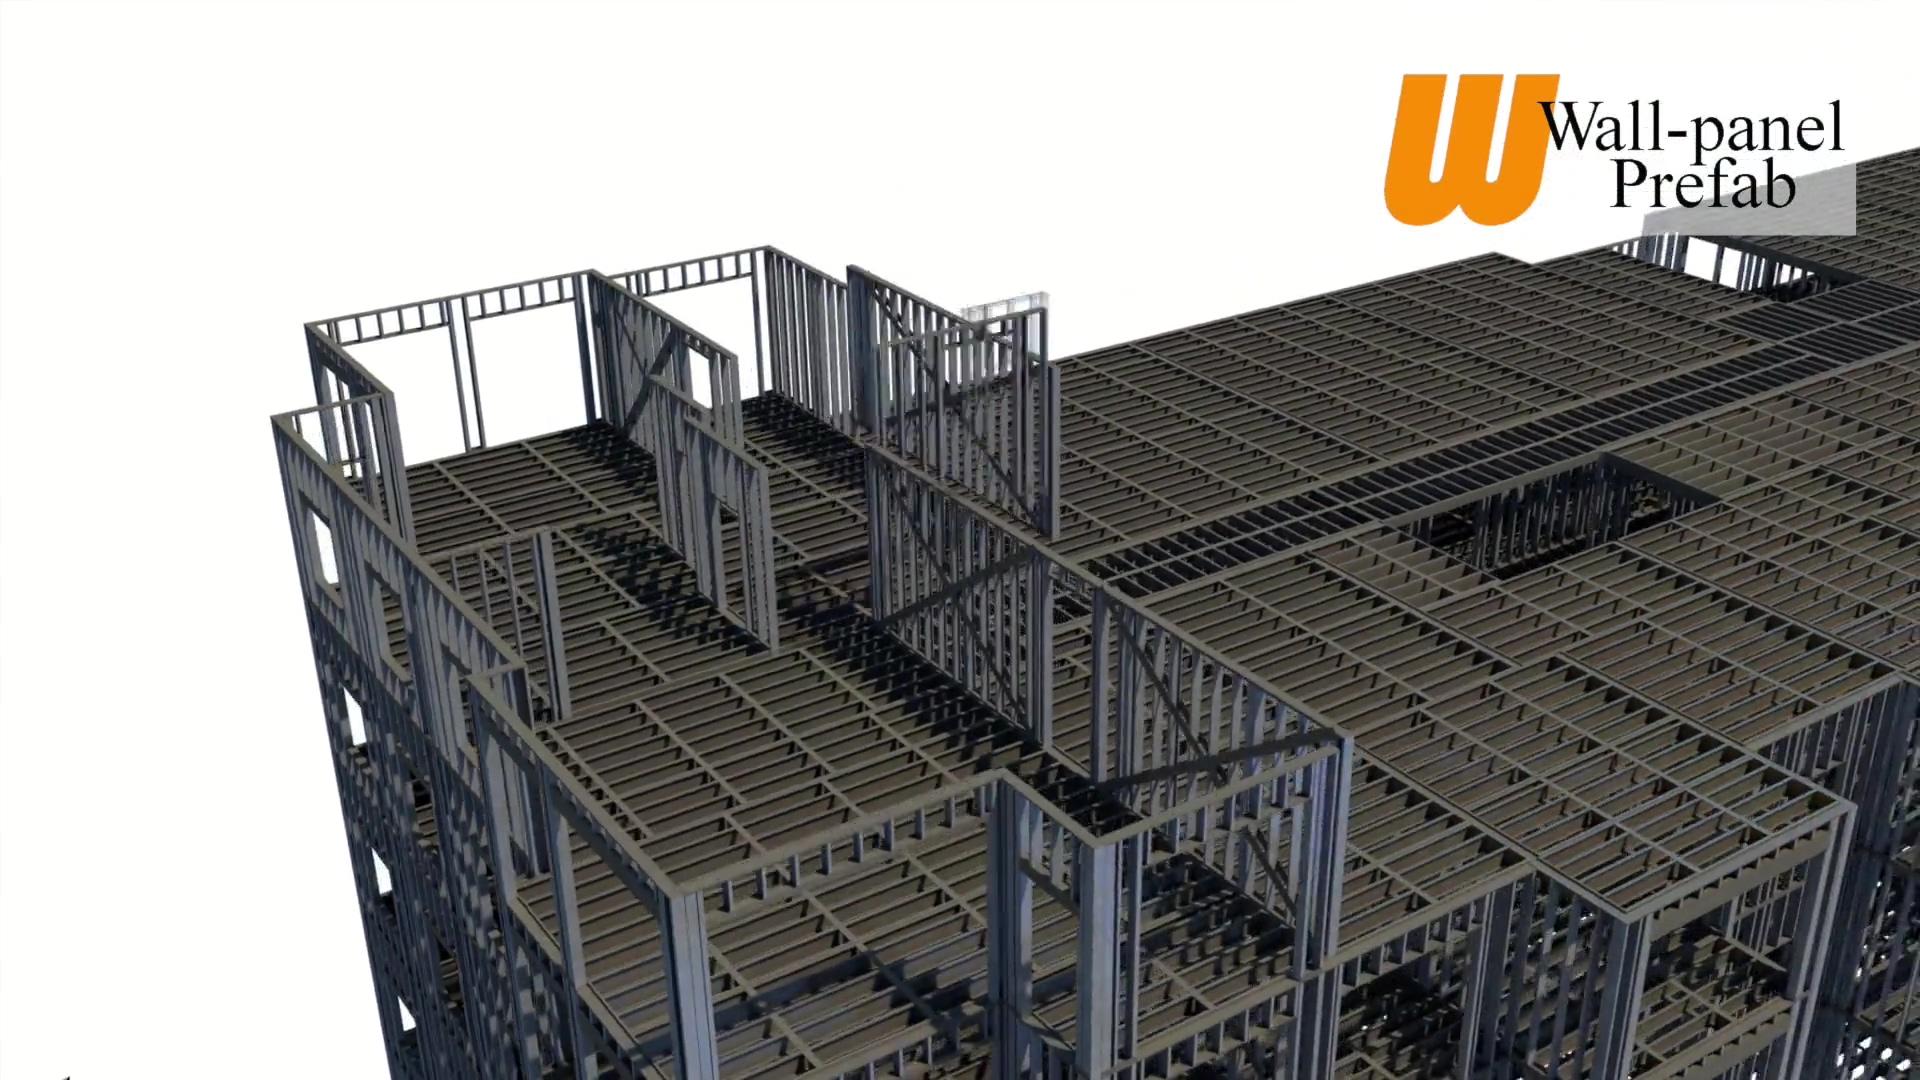 3D Prefab CFS Apartment Video Wall-panel Prefab